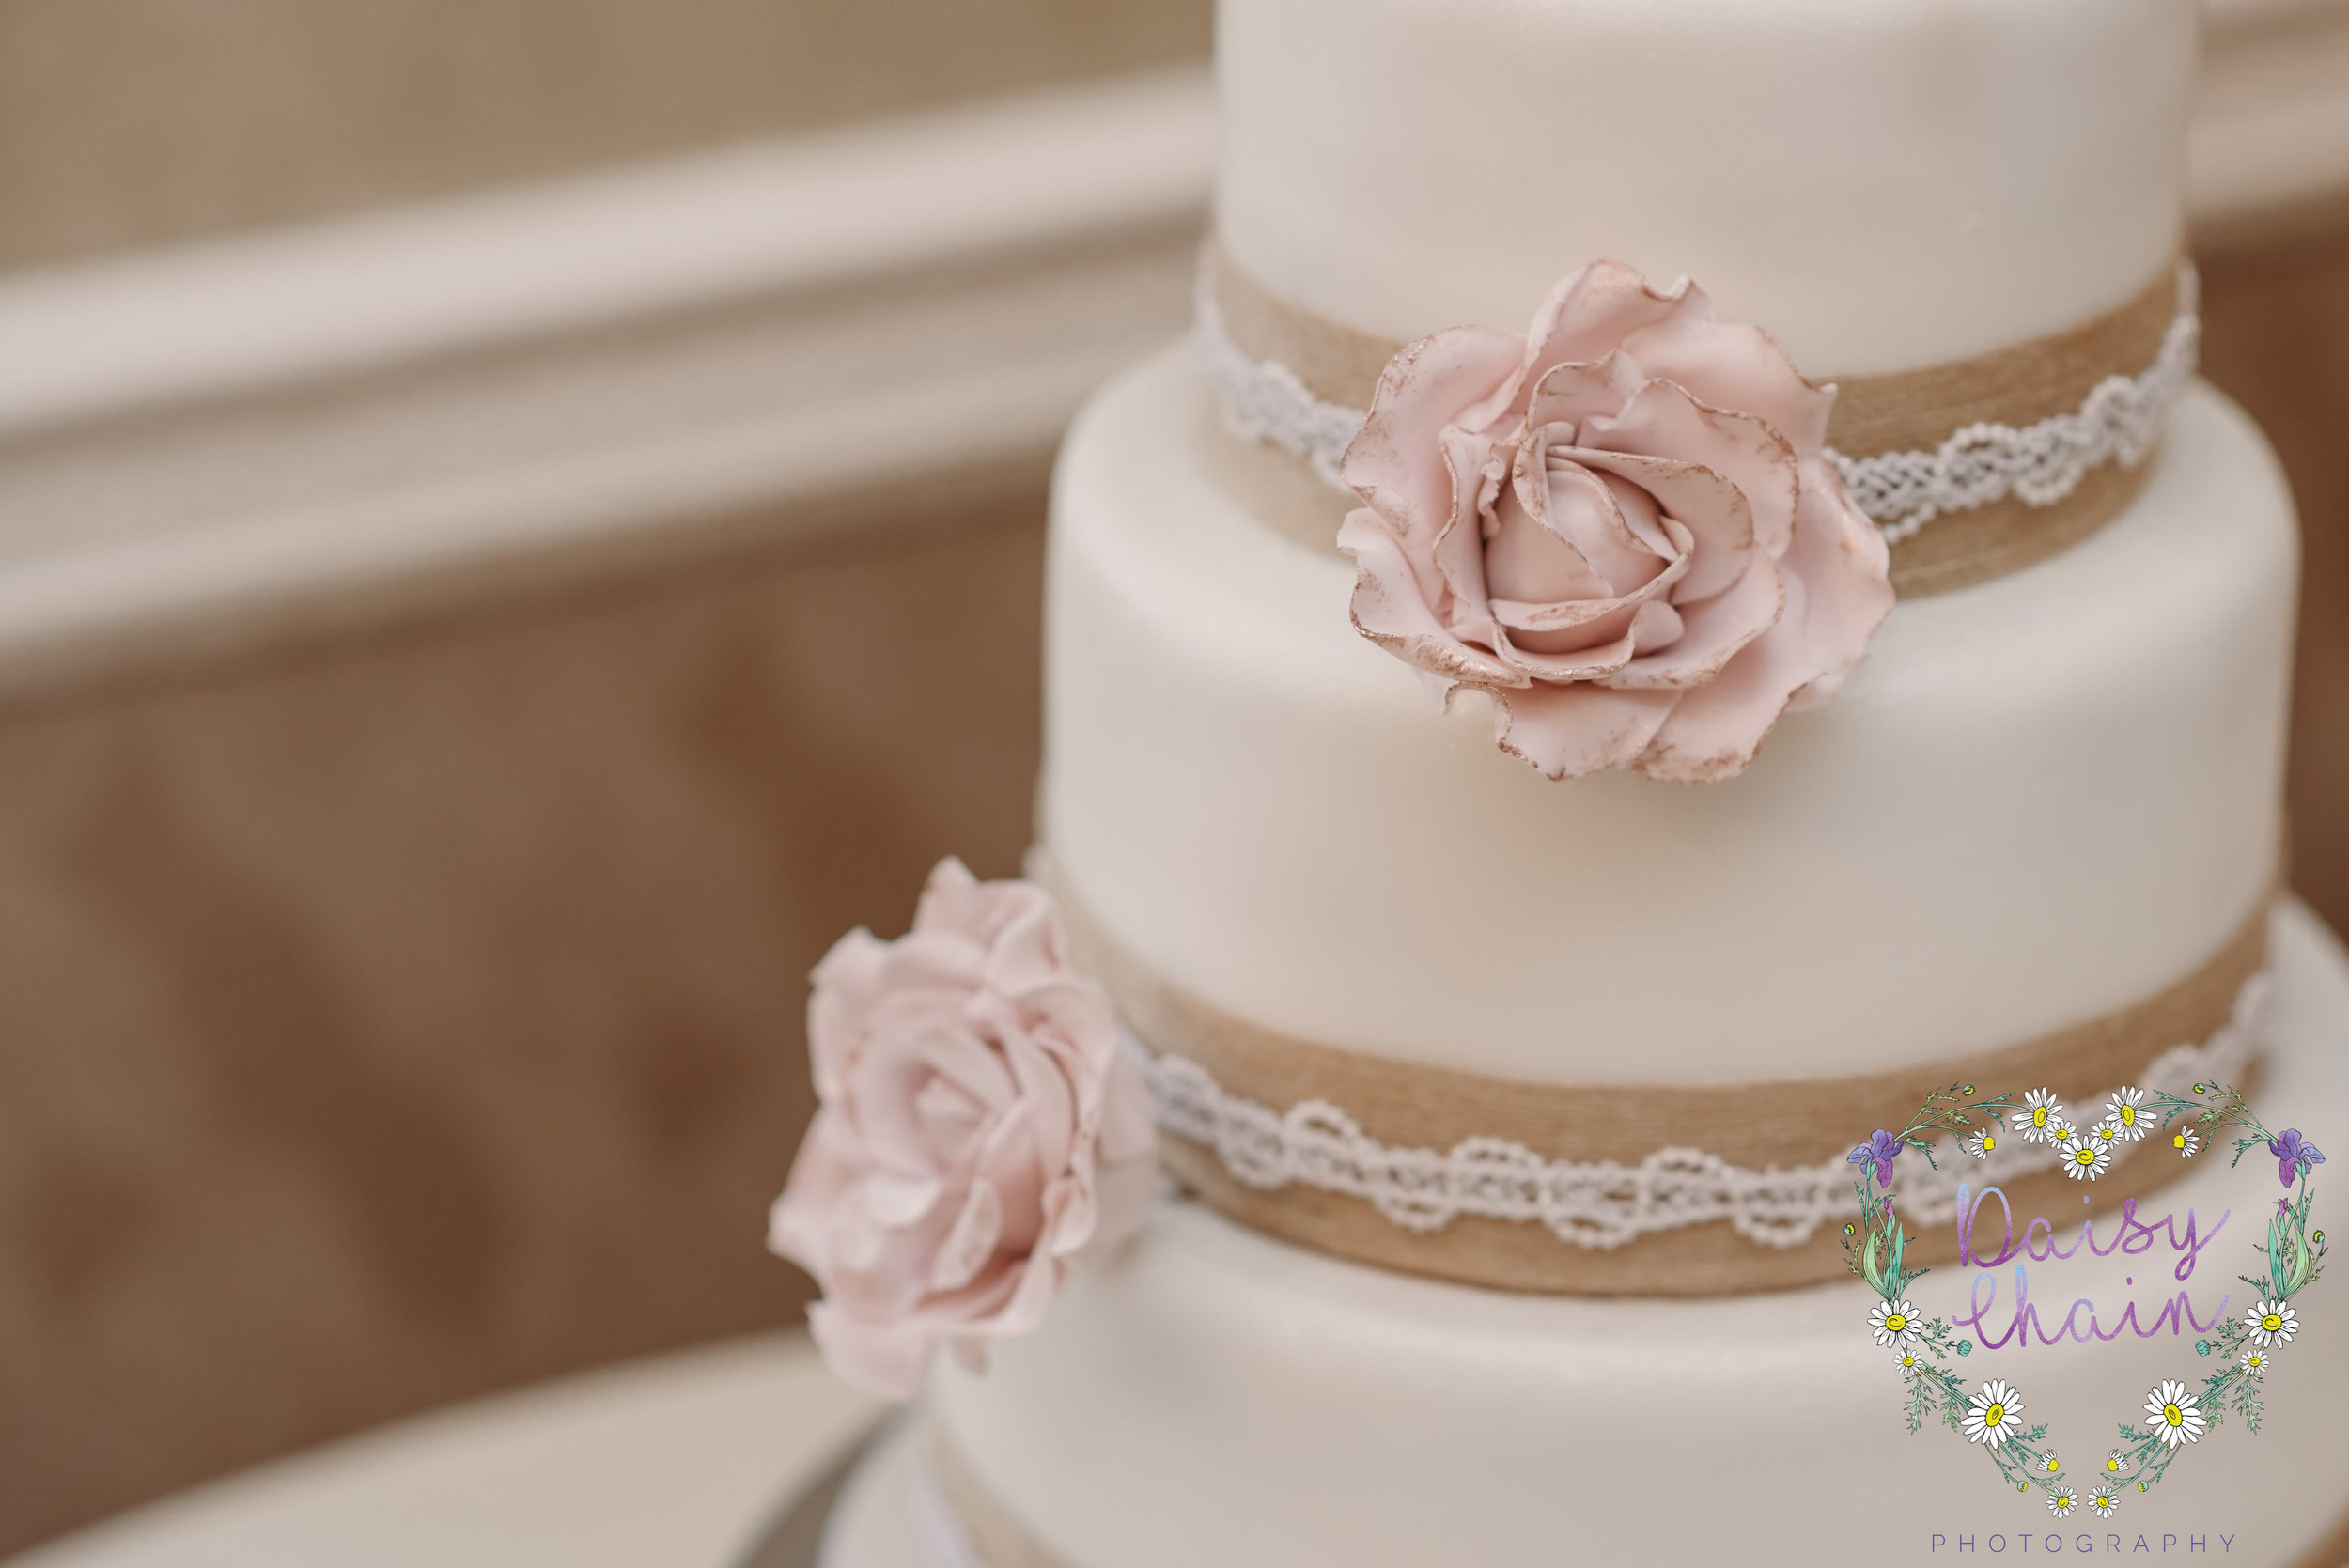 wedding cake and hand made flowers